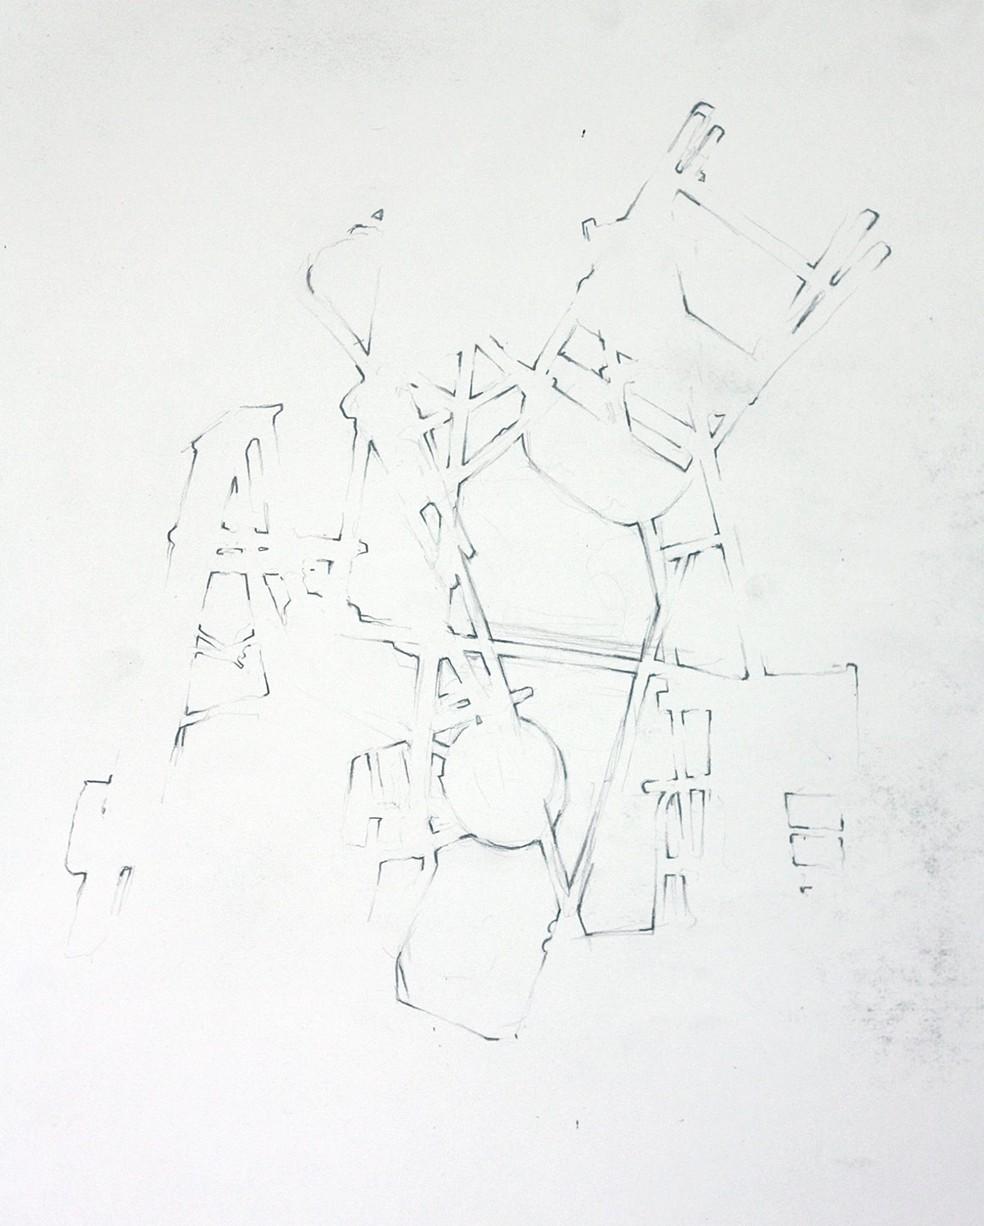 5456b91cbd66a80f7eba47bc482fd4a6.jpg